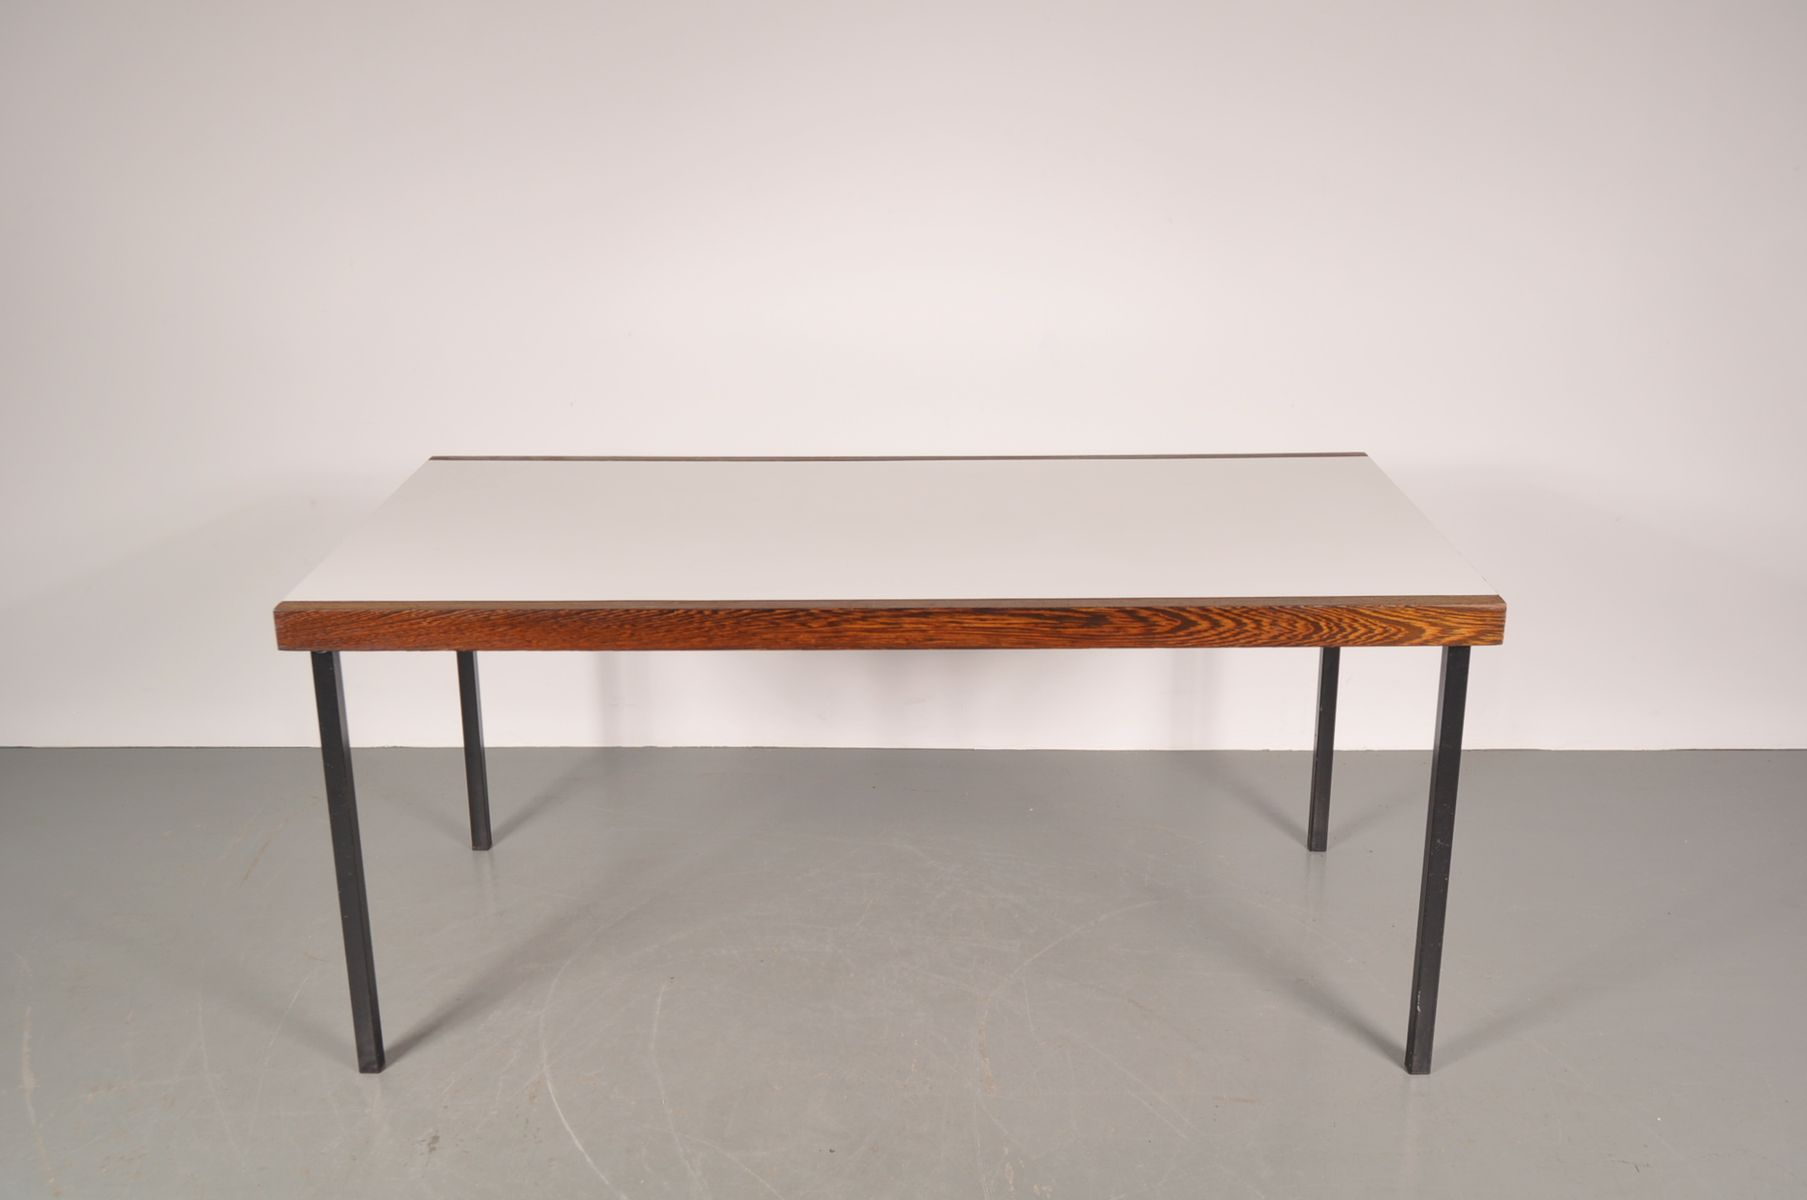 Table de salle manger blanche en weng avec base en for Salle a manger mobel martin